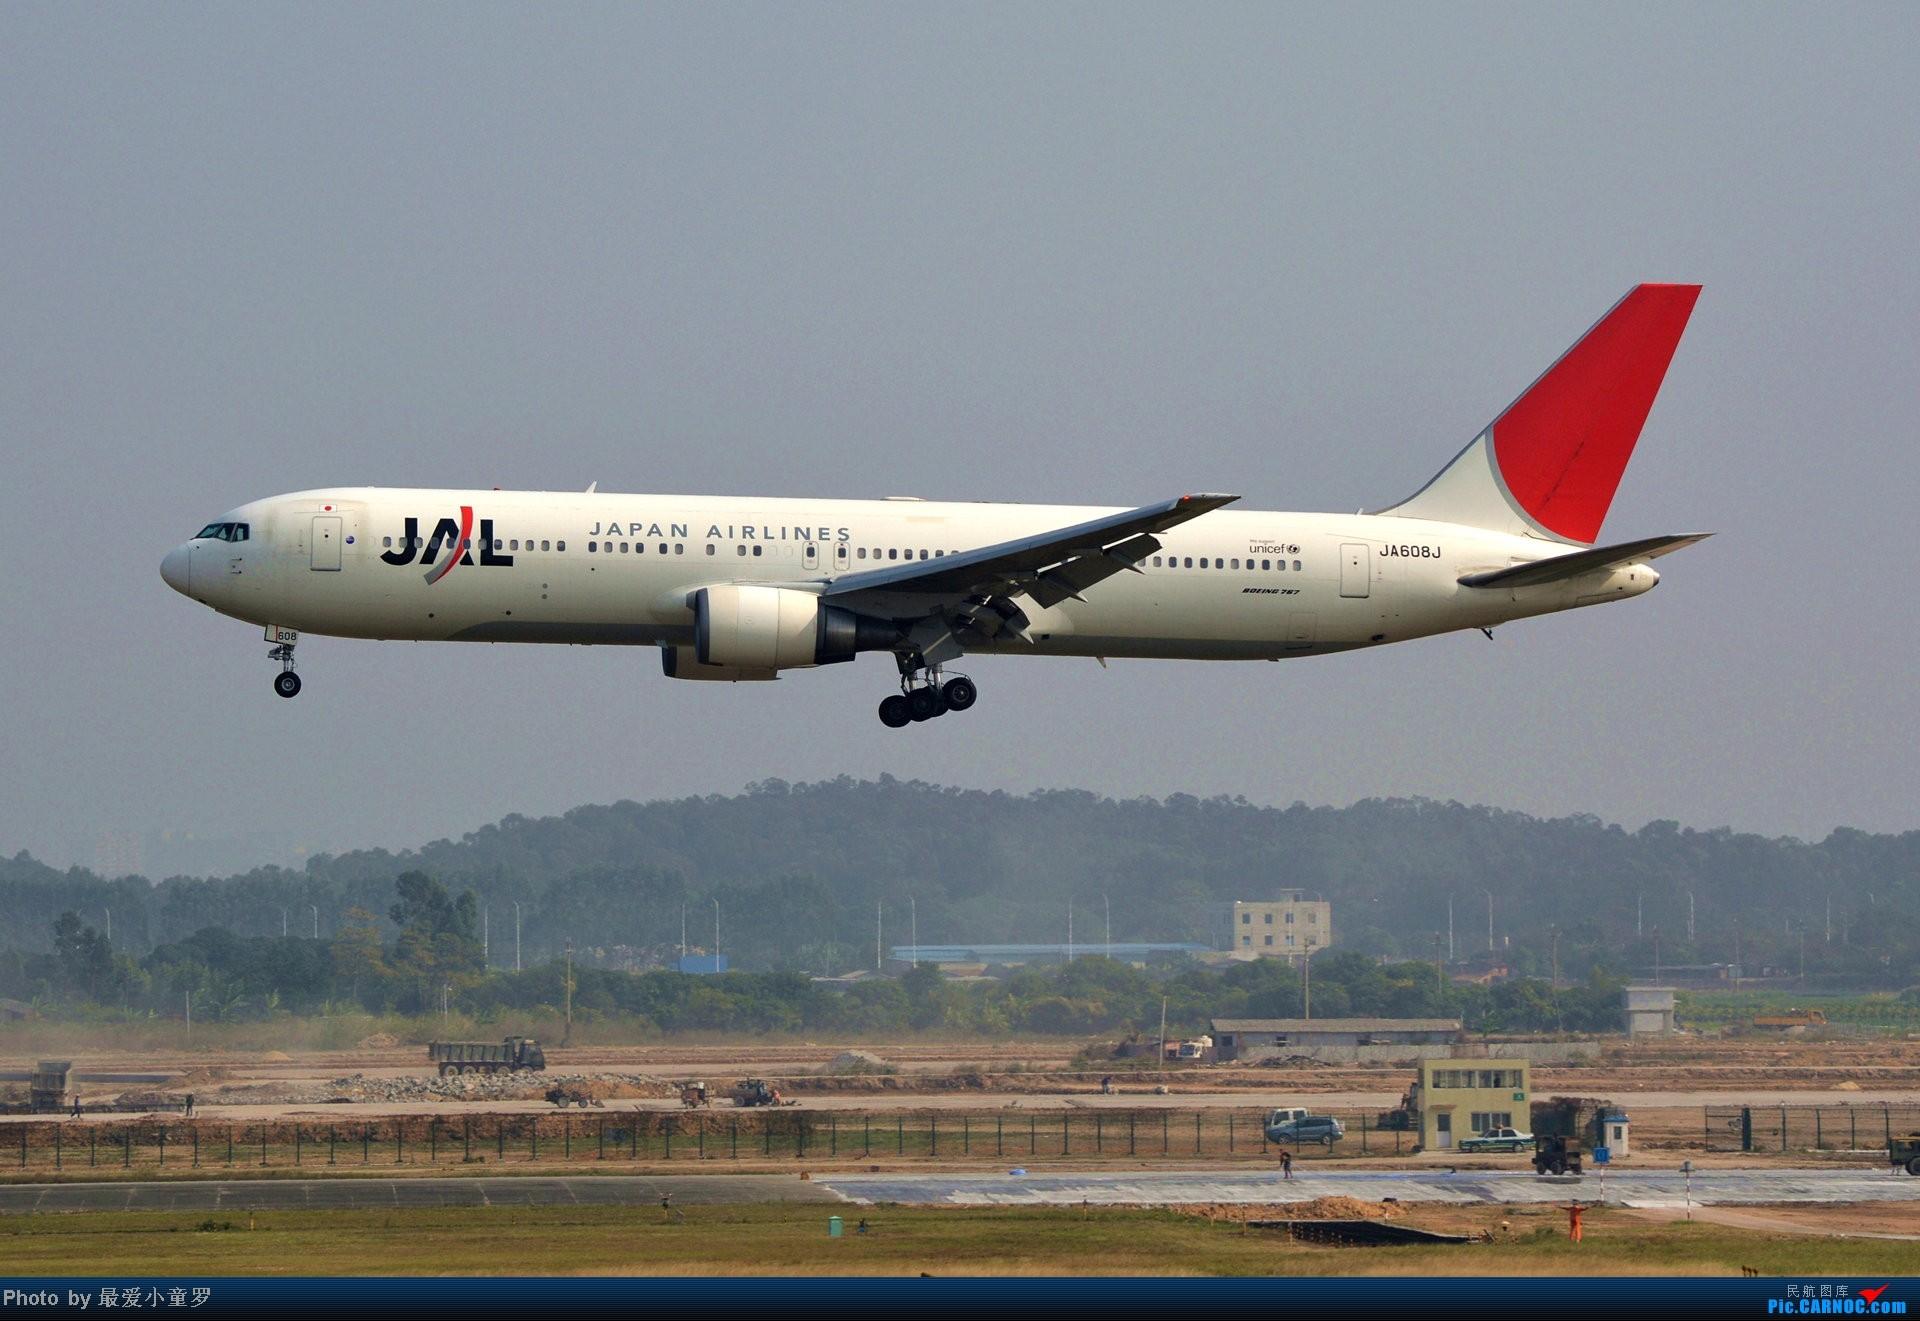 Re:[原创]好天拍机,去年12月21日广州消防塔拍机 BOEING 767-300ER JA608J